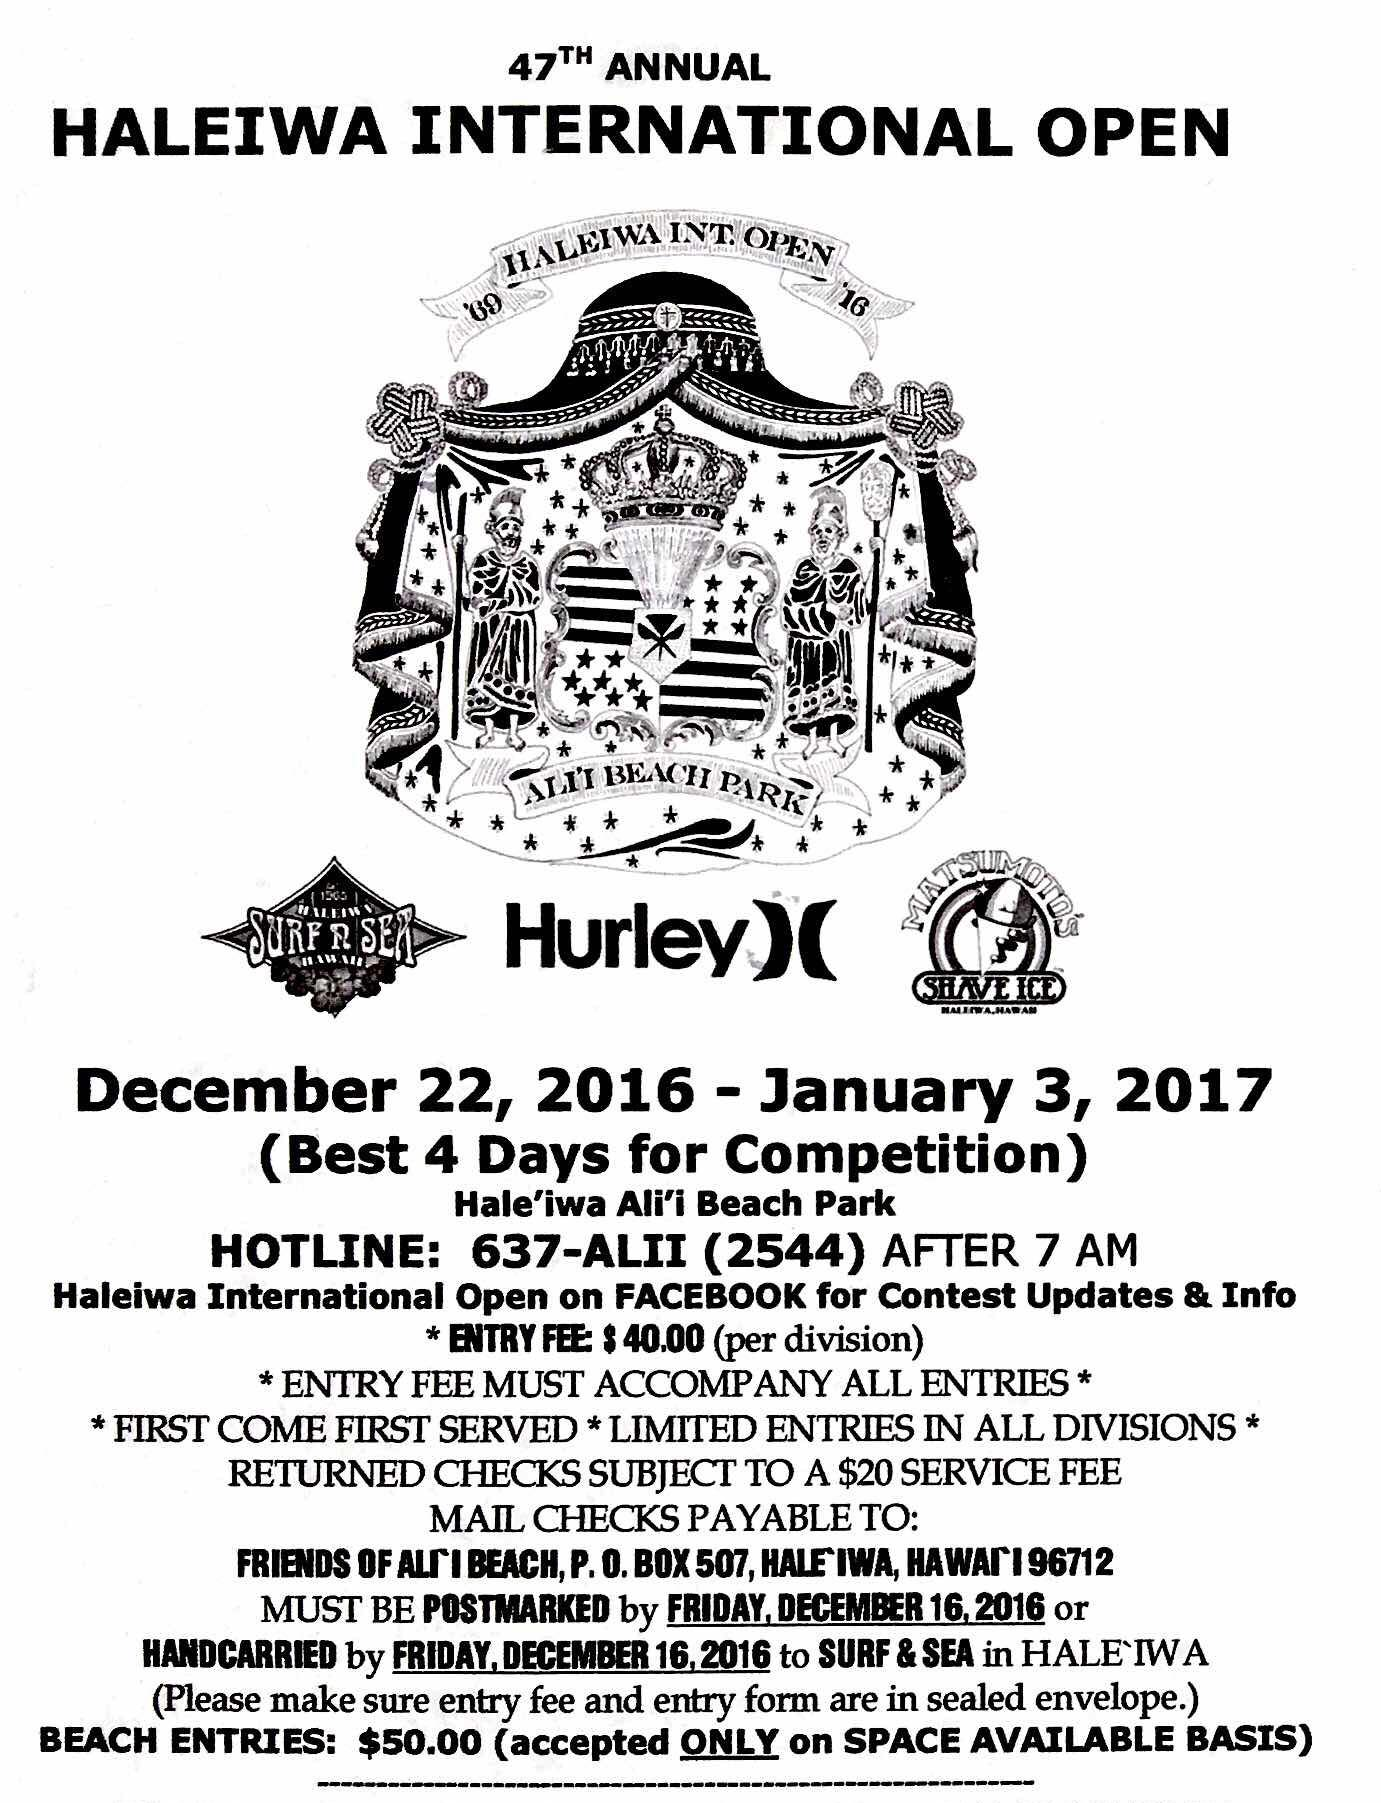 47th Annual Haleiwa International Open